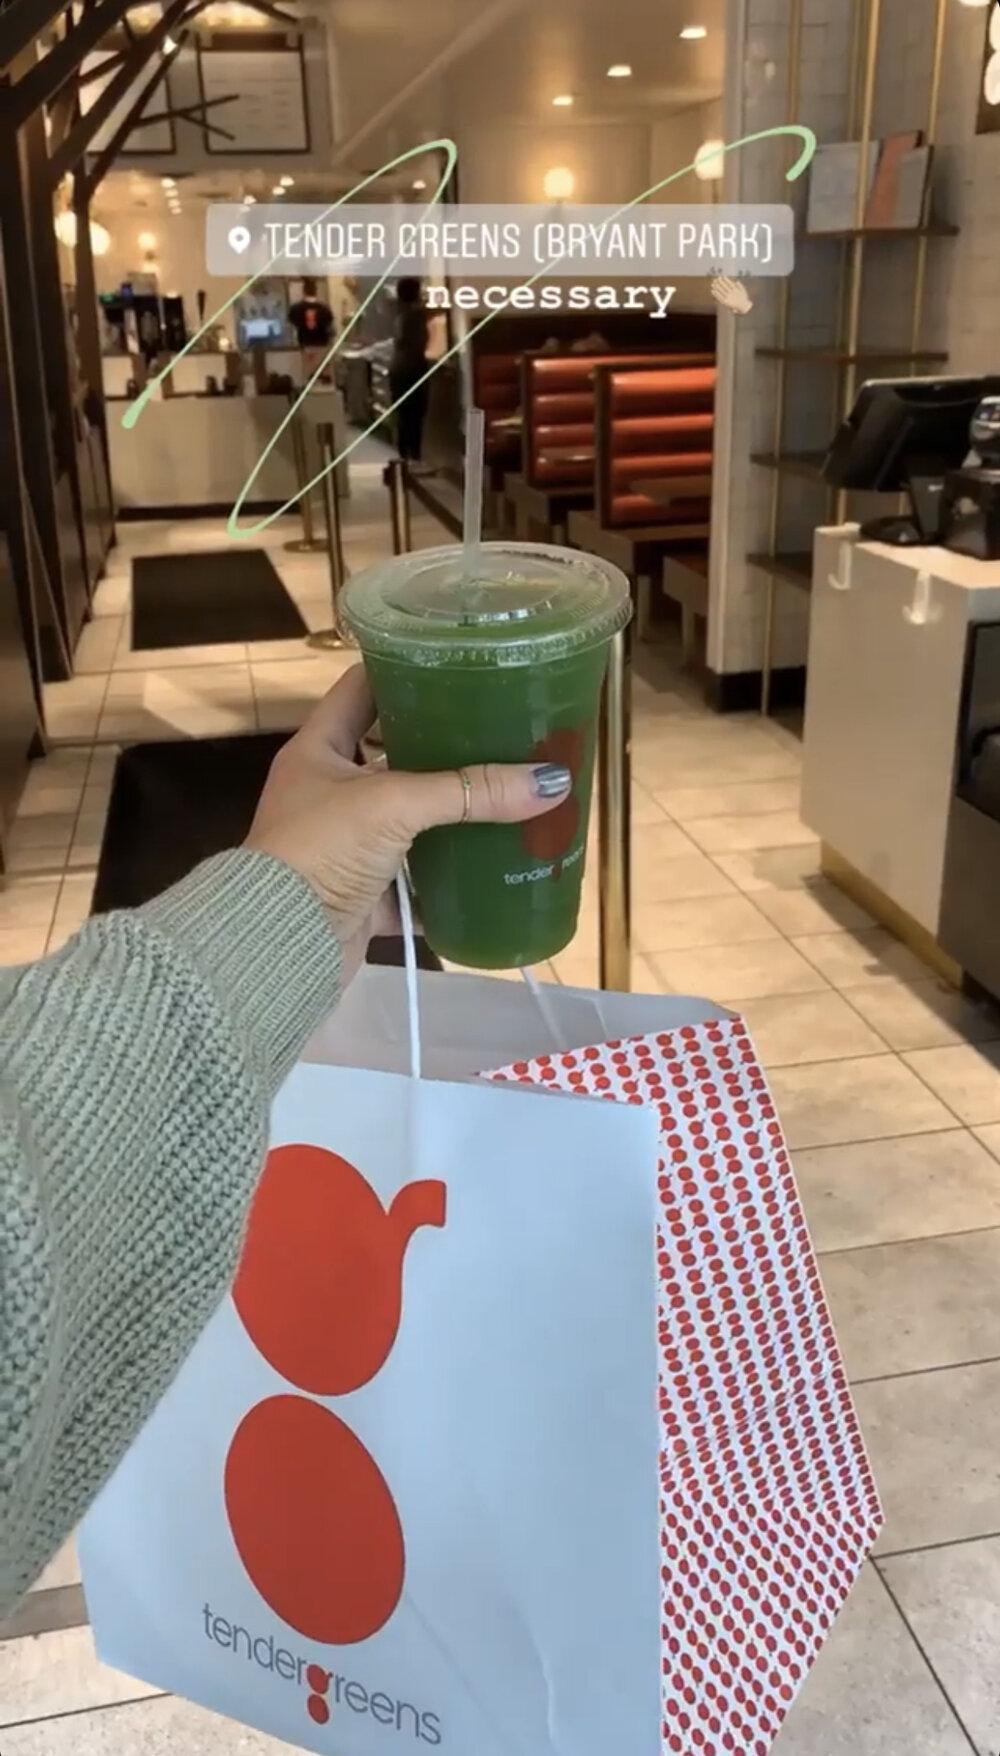 bresheppard.com : NYFW 2019 Tendergreens Snack Stop.jpg